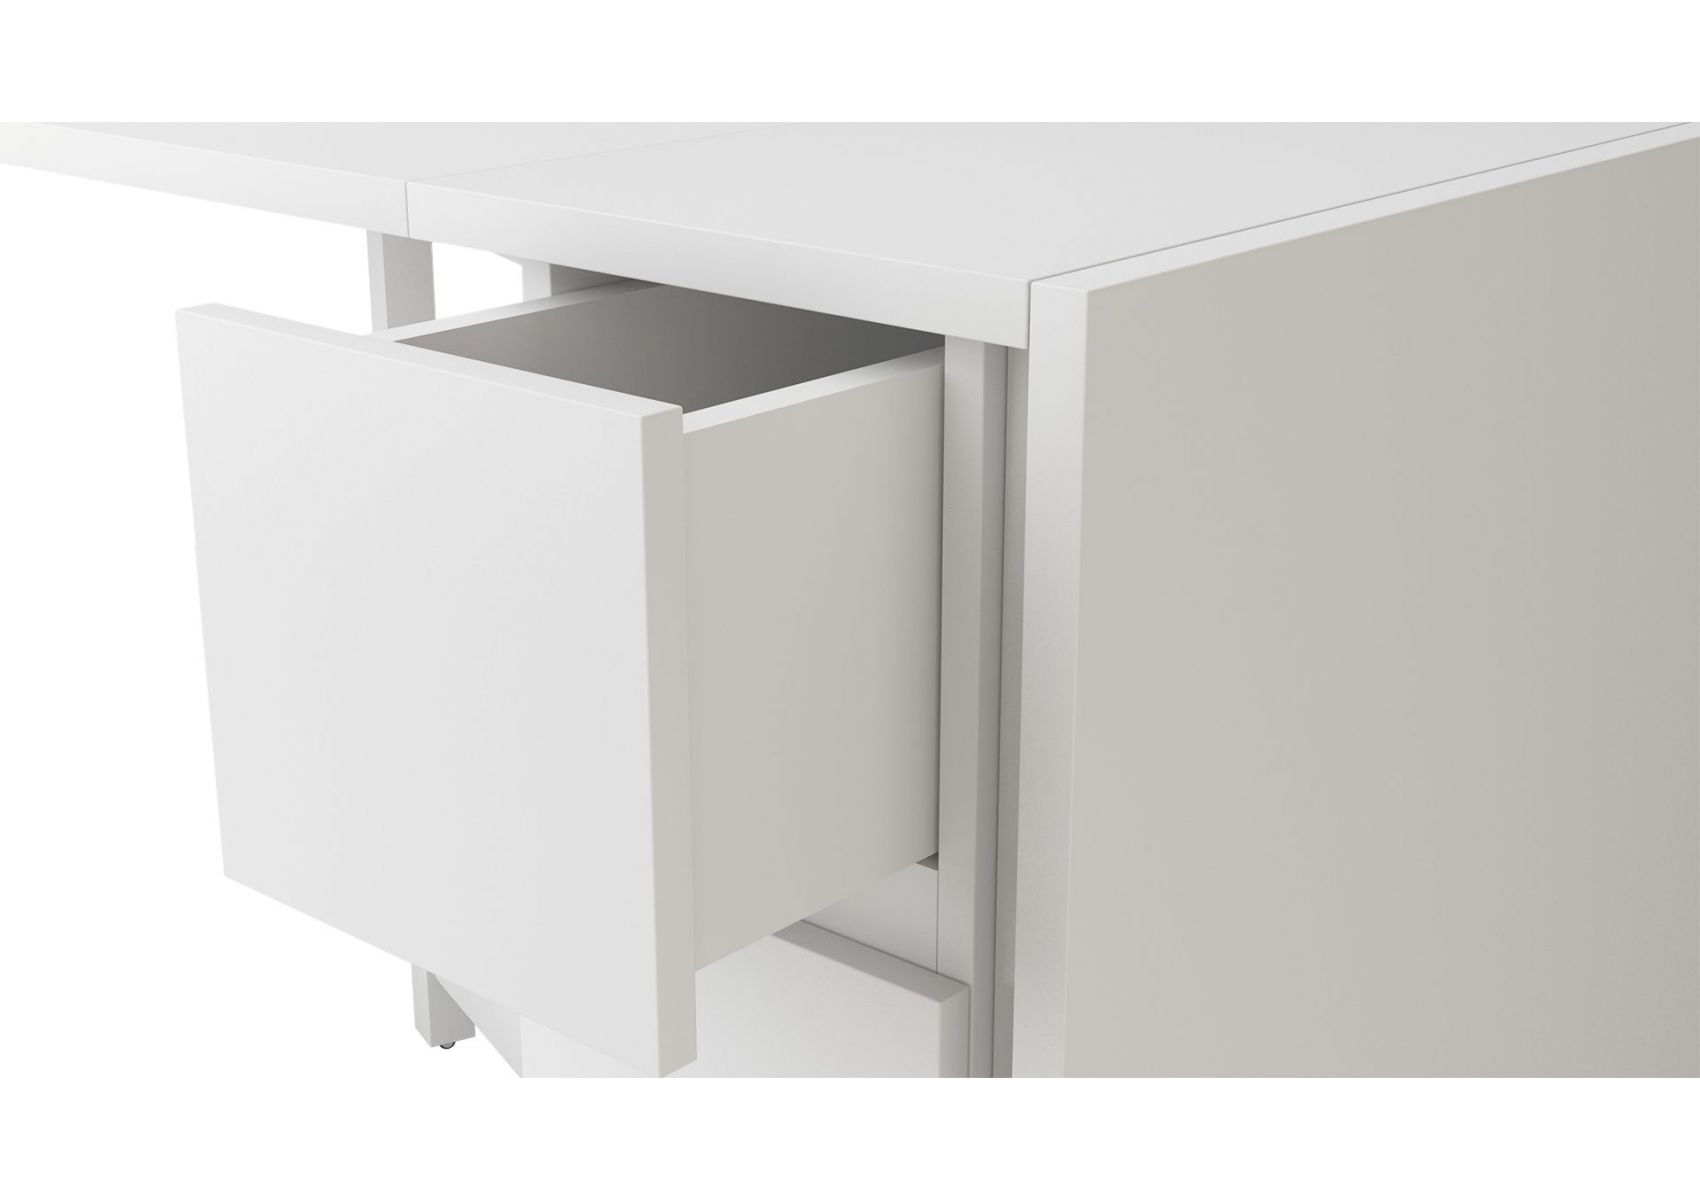 table console pliante kungla de chez woodman. Black Bedroom Furniture Sets. Home Design Ideas